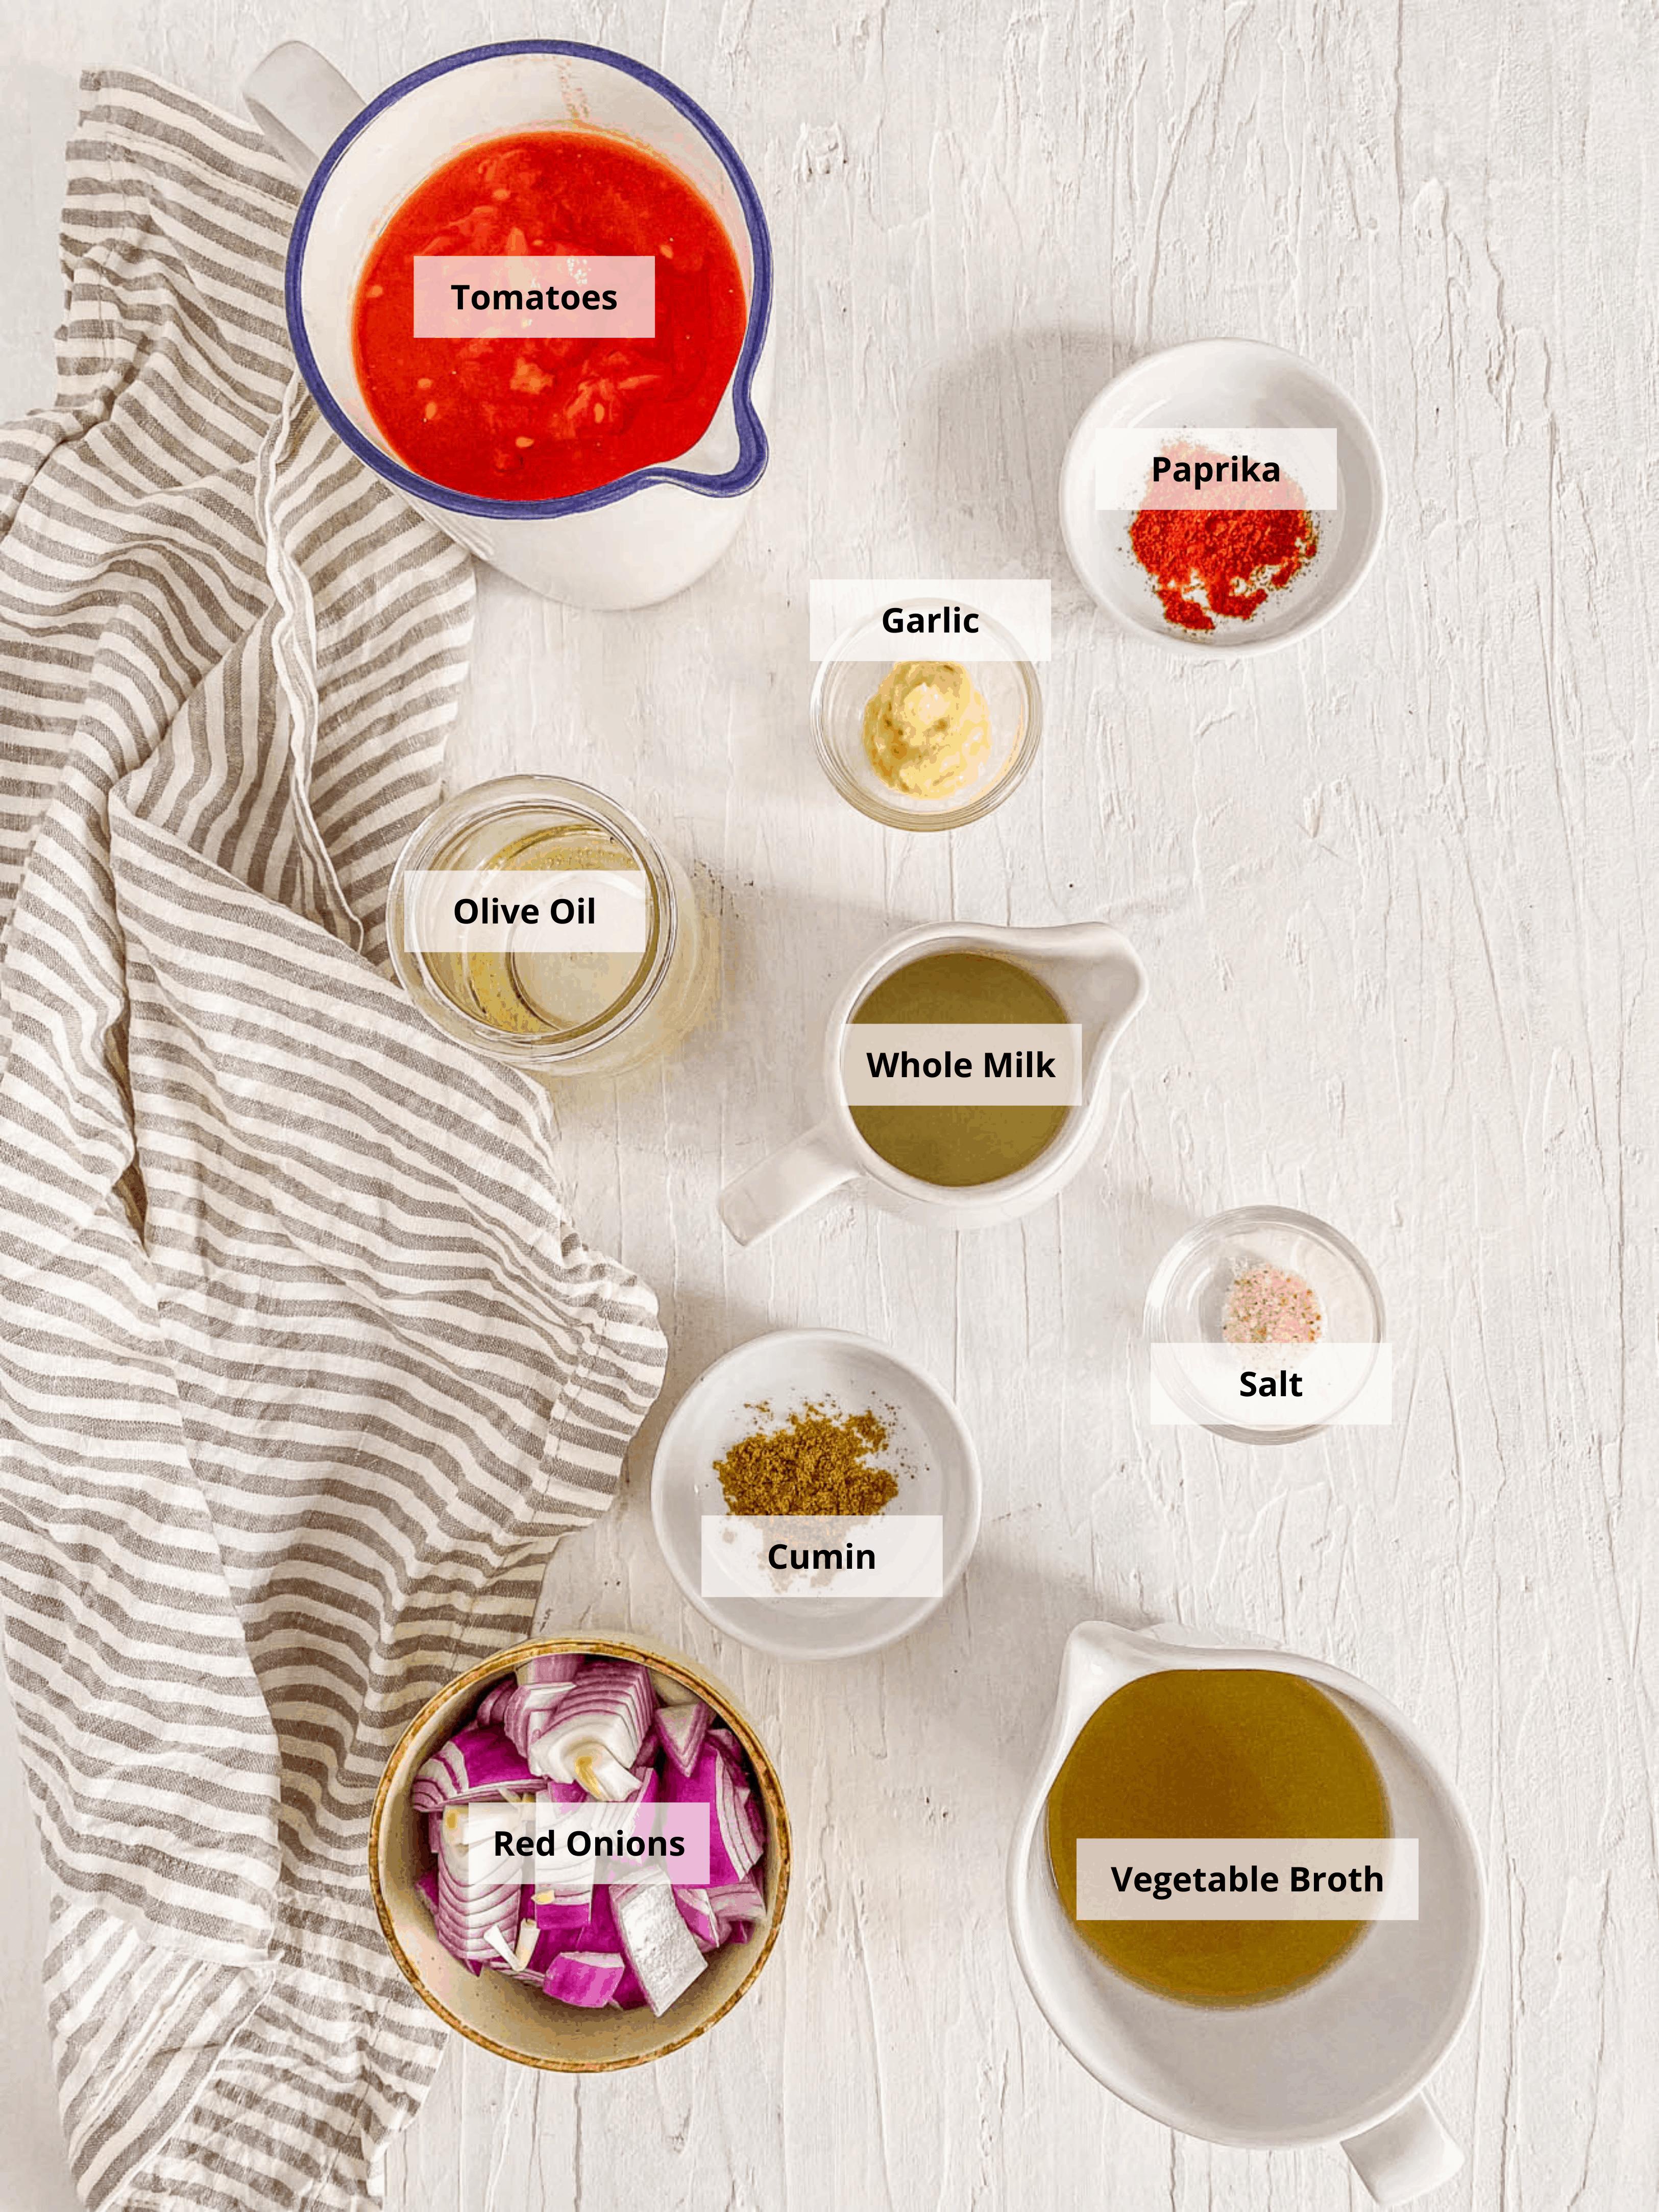 ingredients for instant pot tomato soup - keto tomato soup